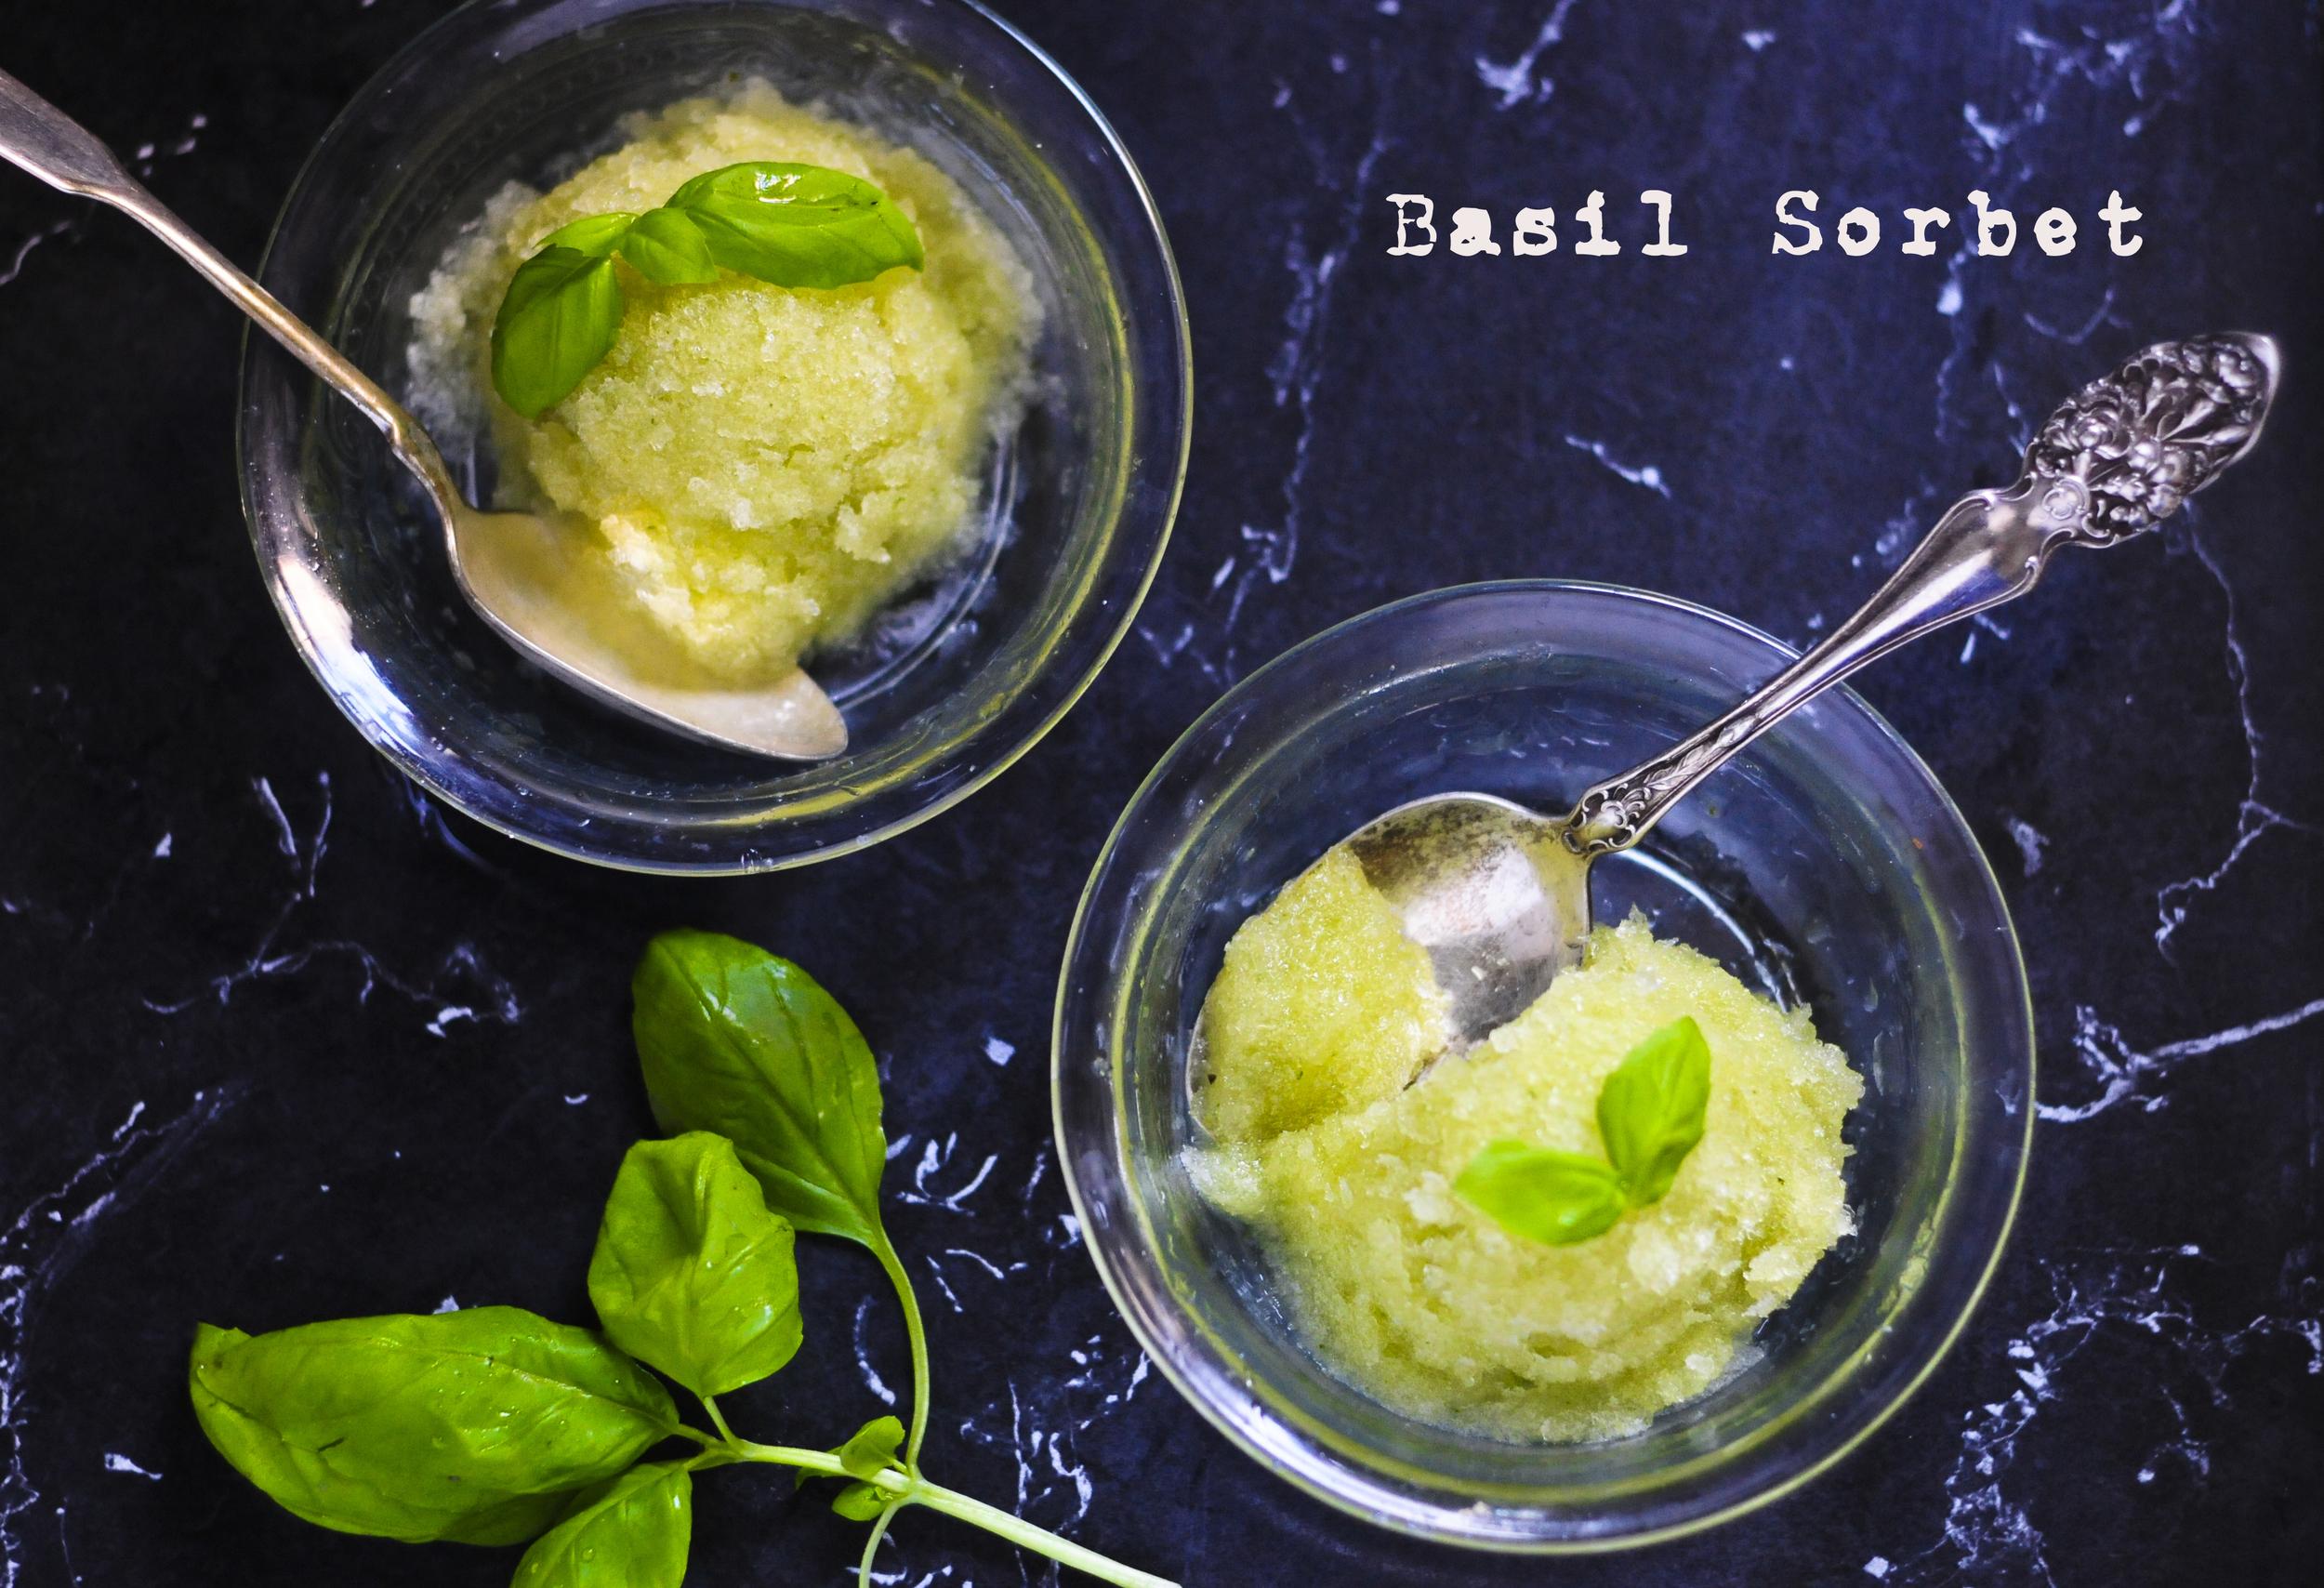 a.big.name.basil.sorbet.ice.herbs.dessert.snack.DSC_7023.jpg